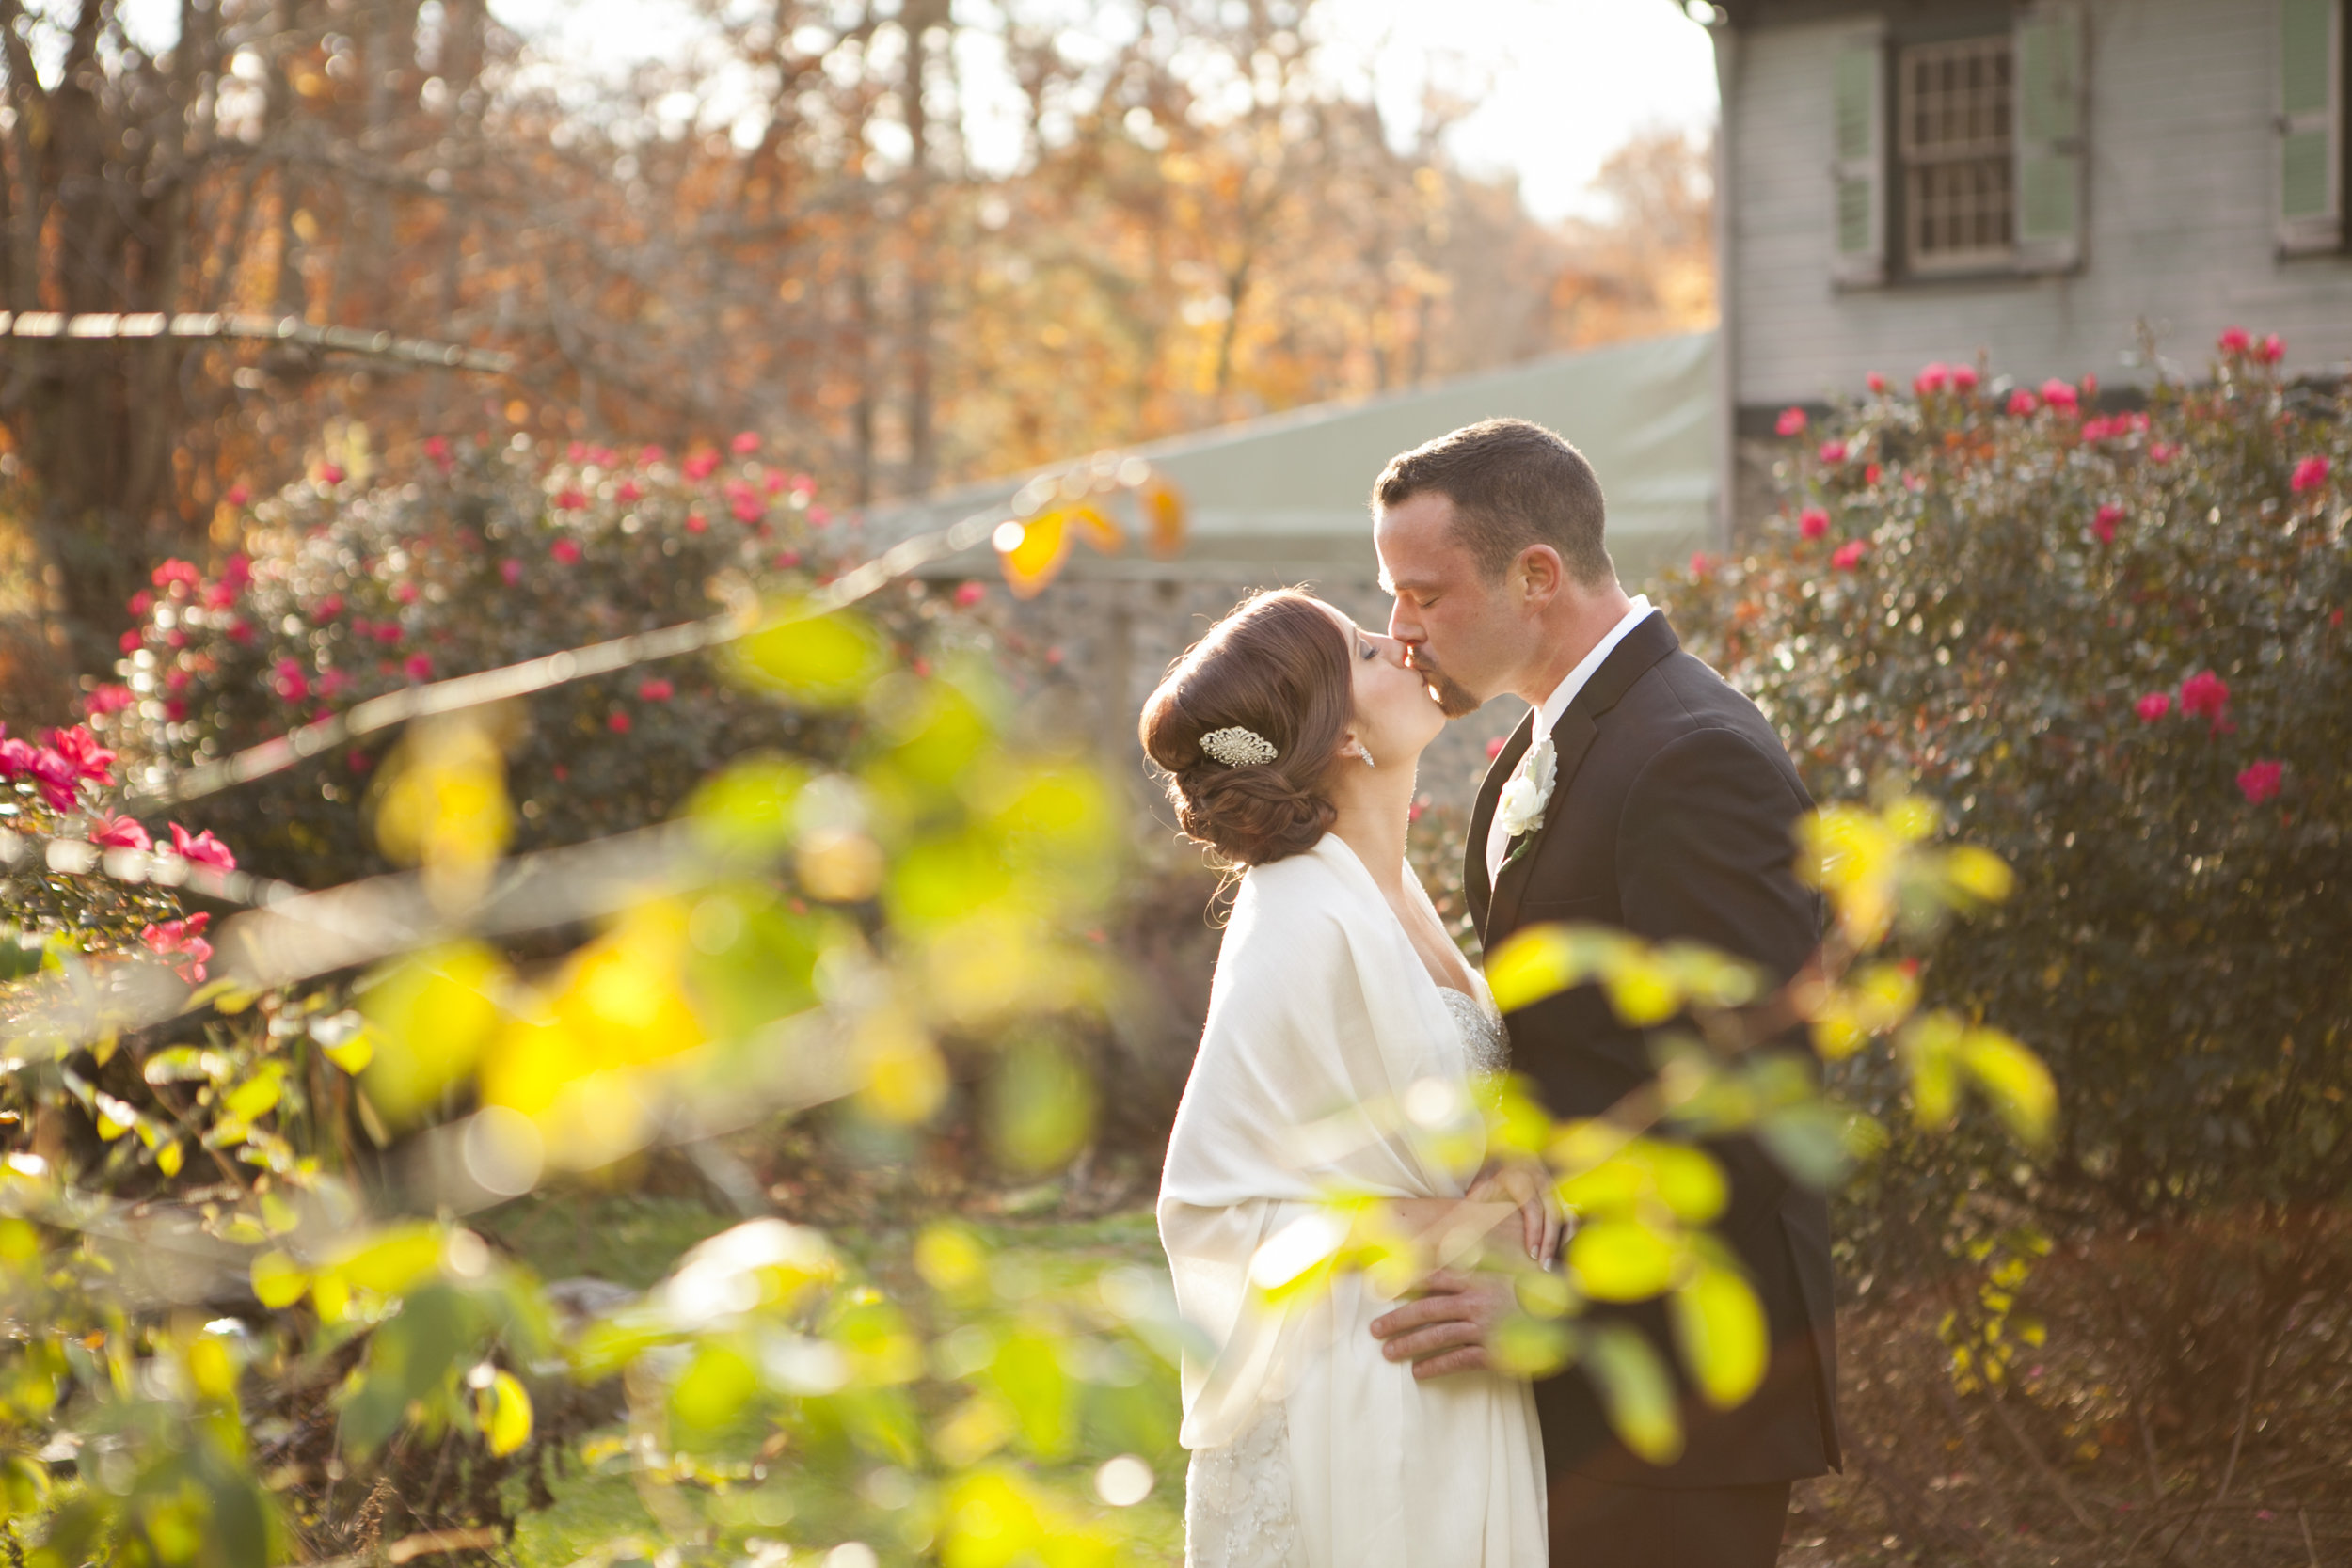 South Jersey wedding photographer, Fall wedding photography, NJ Wedding Photographer, new jersey wedding photographer, wedding photography